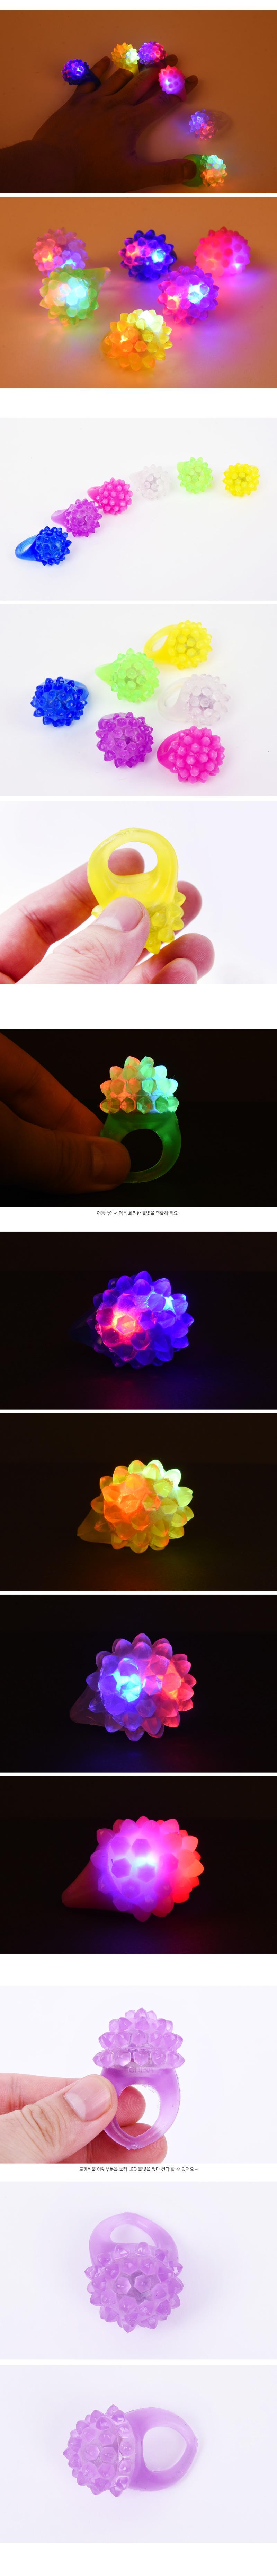 LED 도깨비 반지(색상랜덤) - 파티해, 1,140원, 파티용품, 할로윈 파티